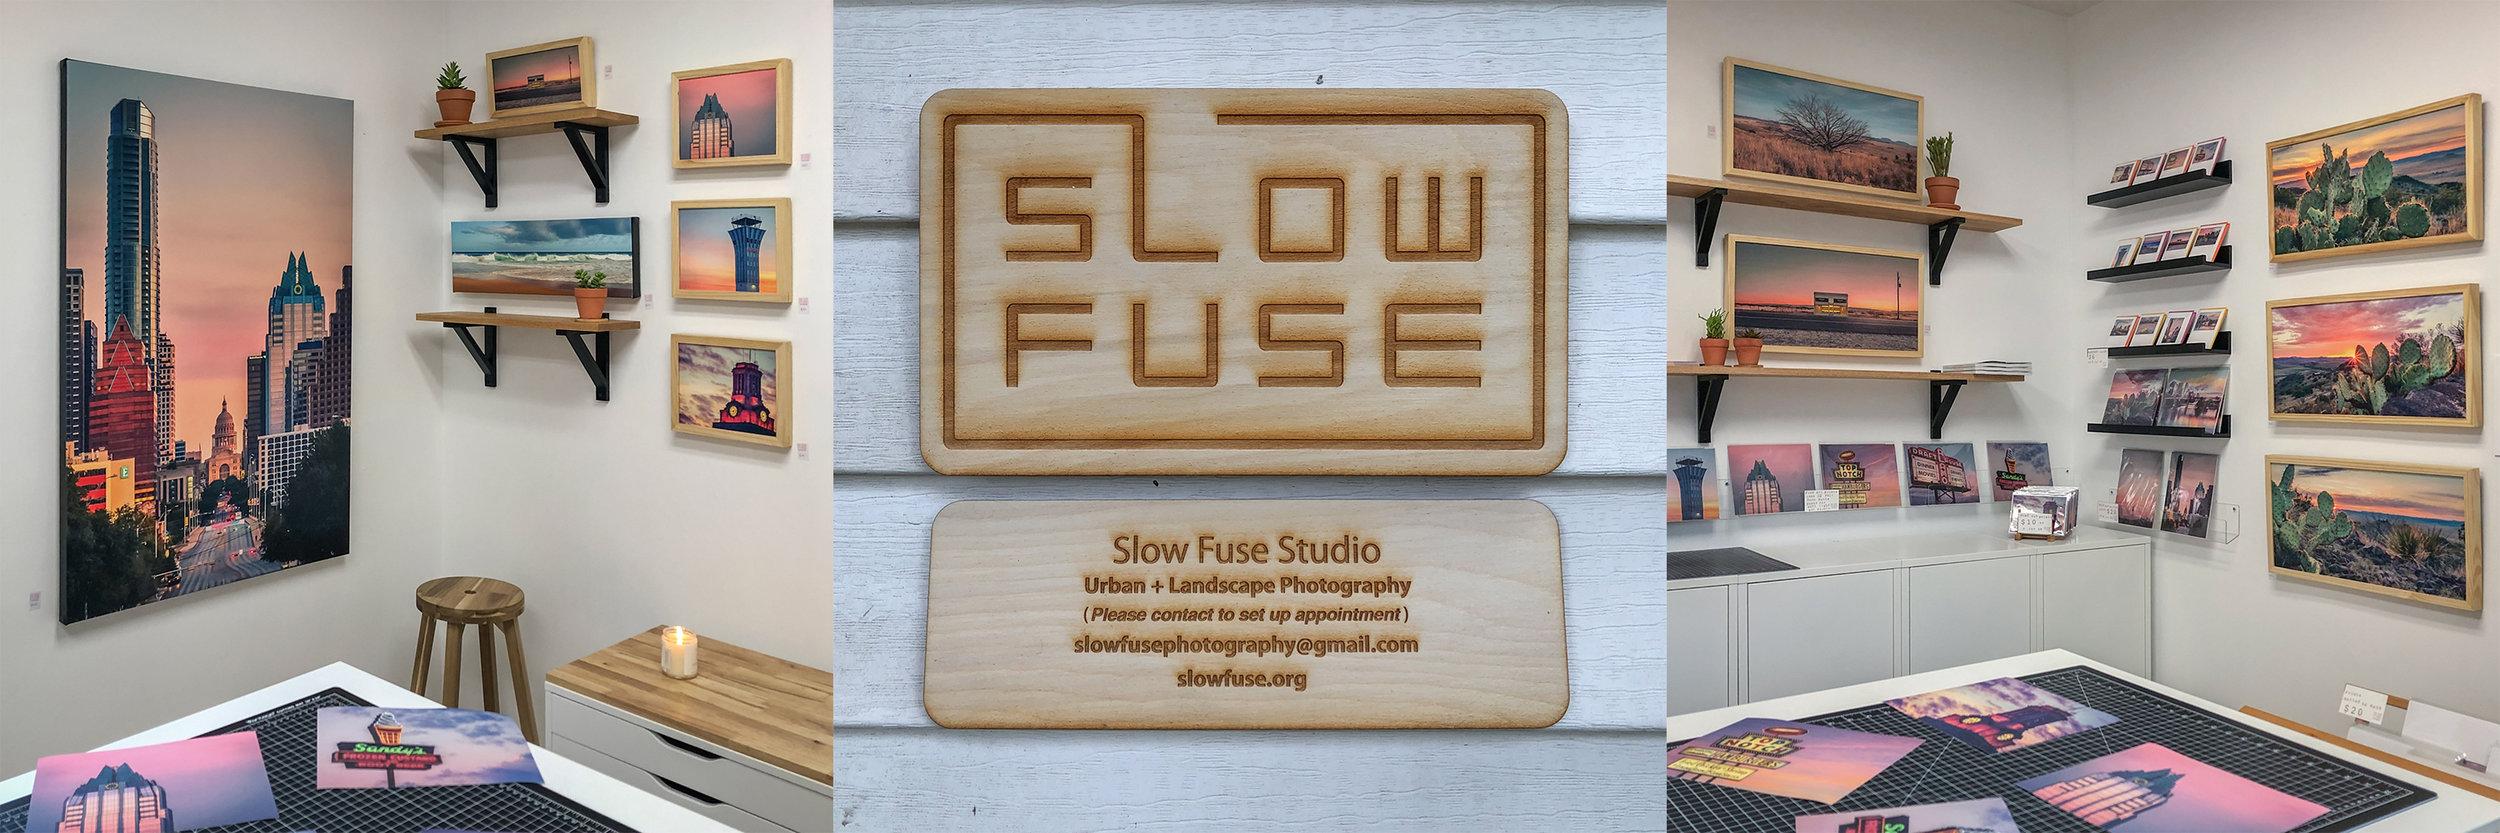 Slow-Fuse-Studio-Austin-collage.jpg